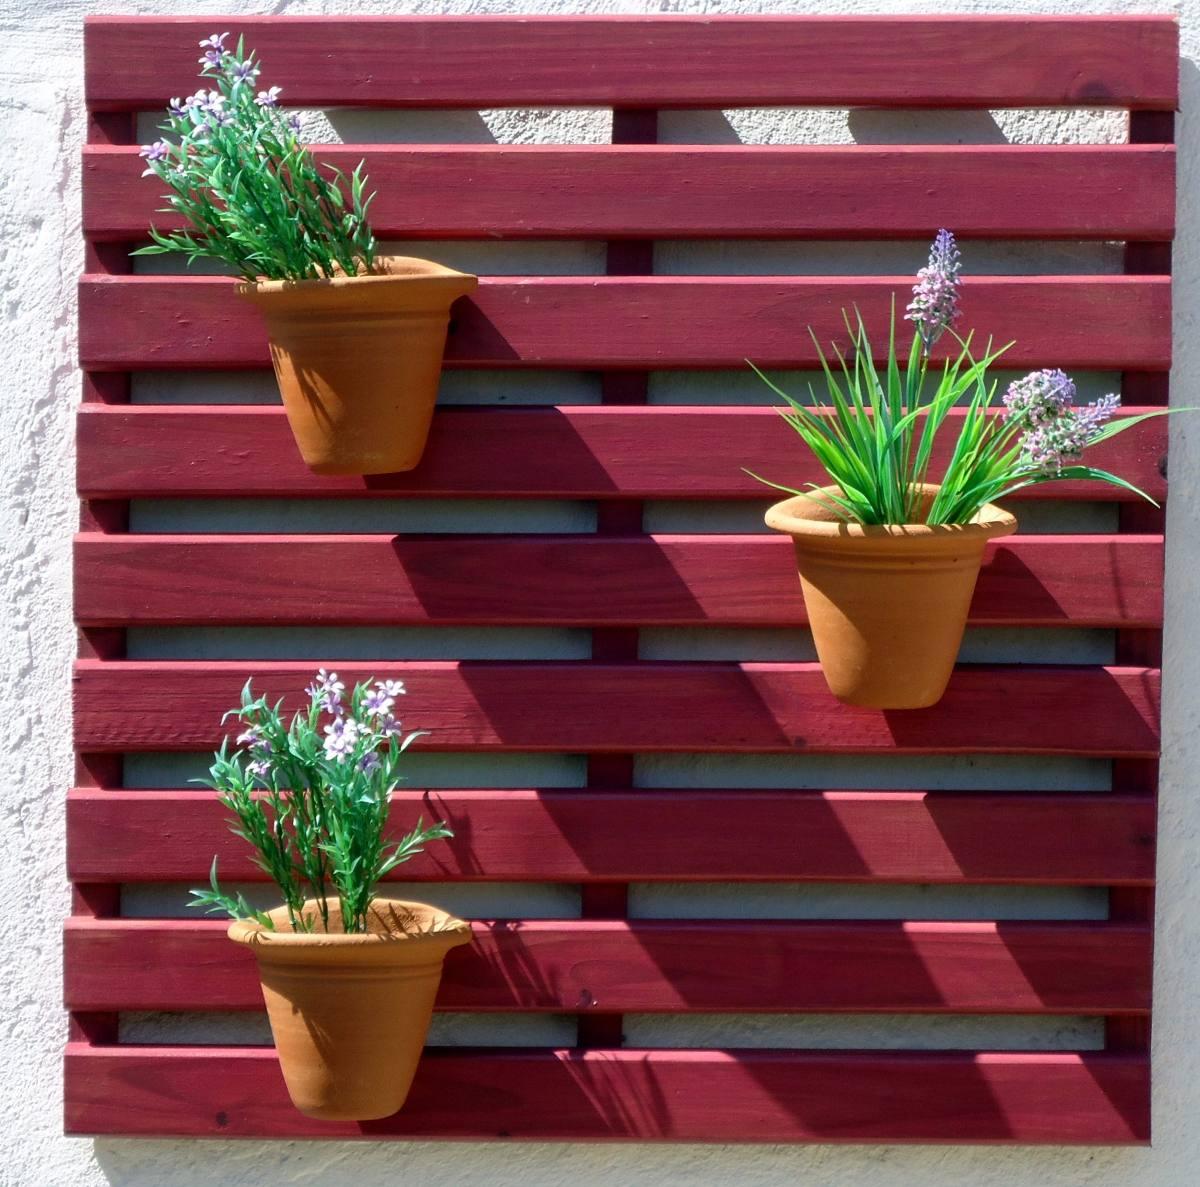 jardim vertical venda:Painel De Madeira Para Jardim Vertical – Réguas Framboesa – R$ 89,80